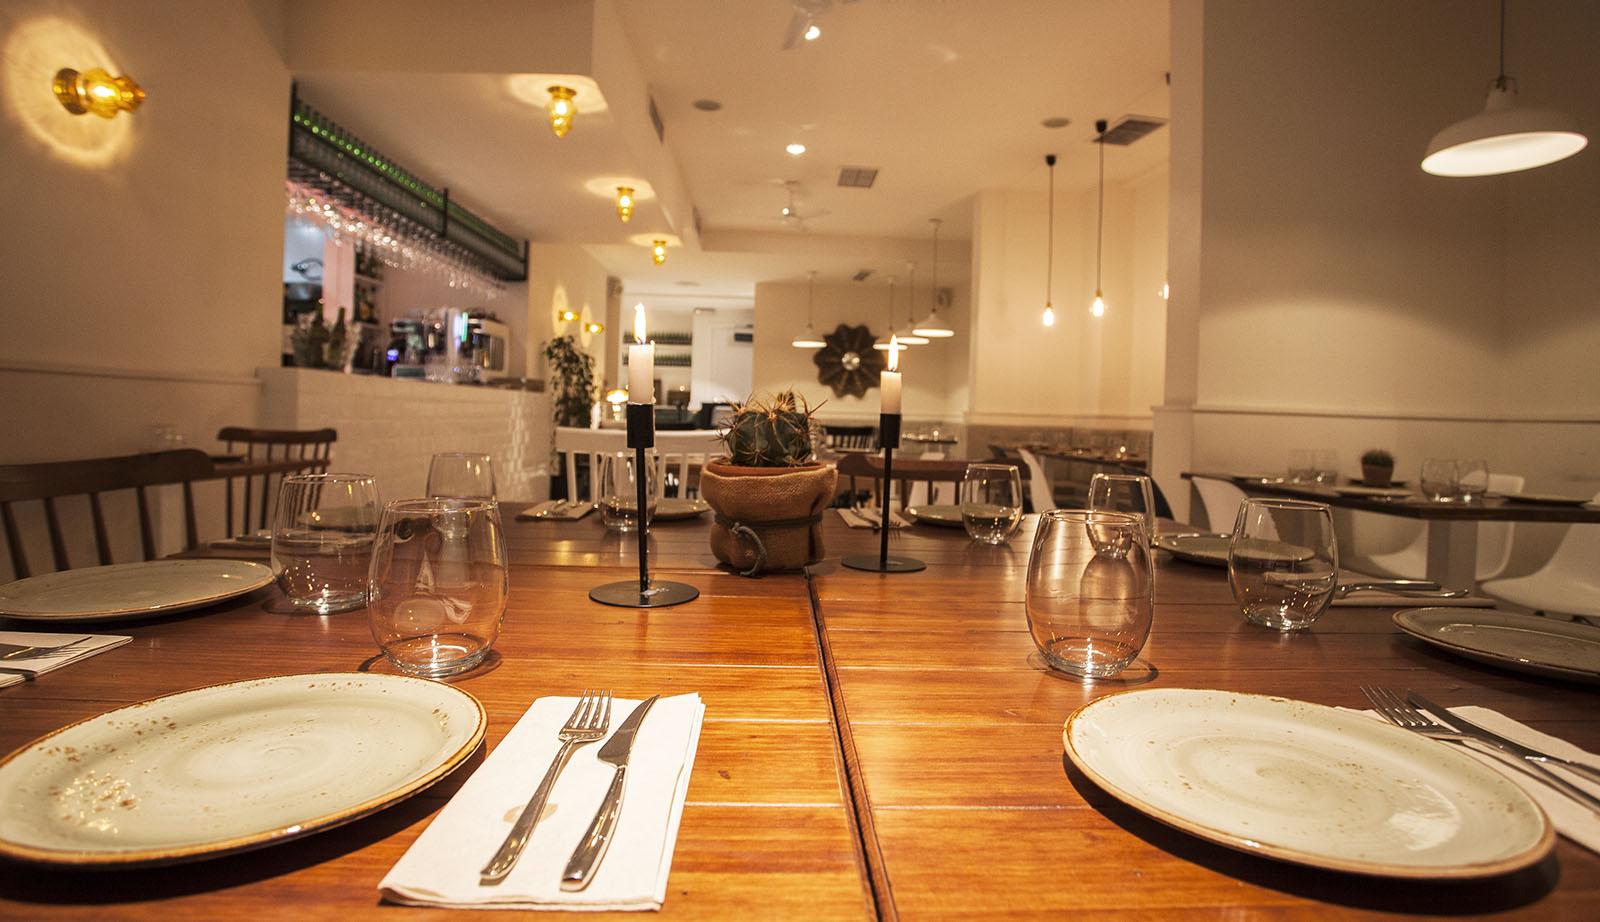 restaurante en alcalá de henares